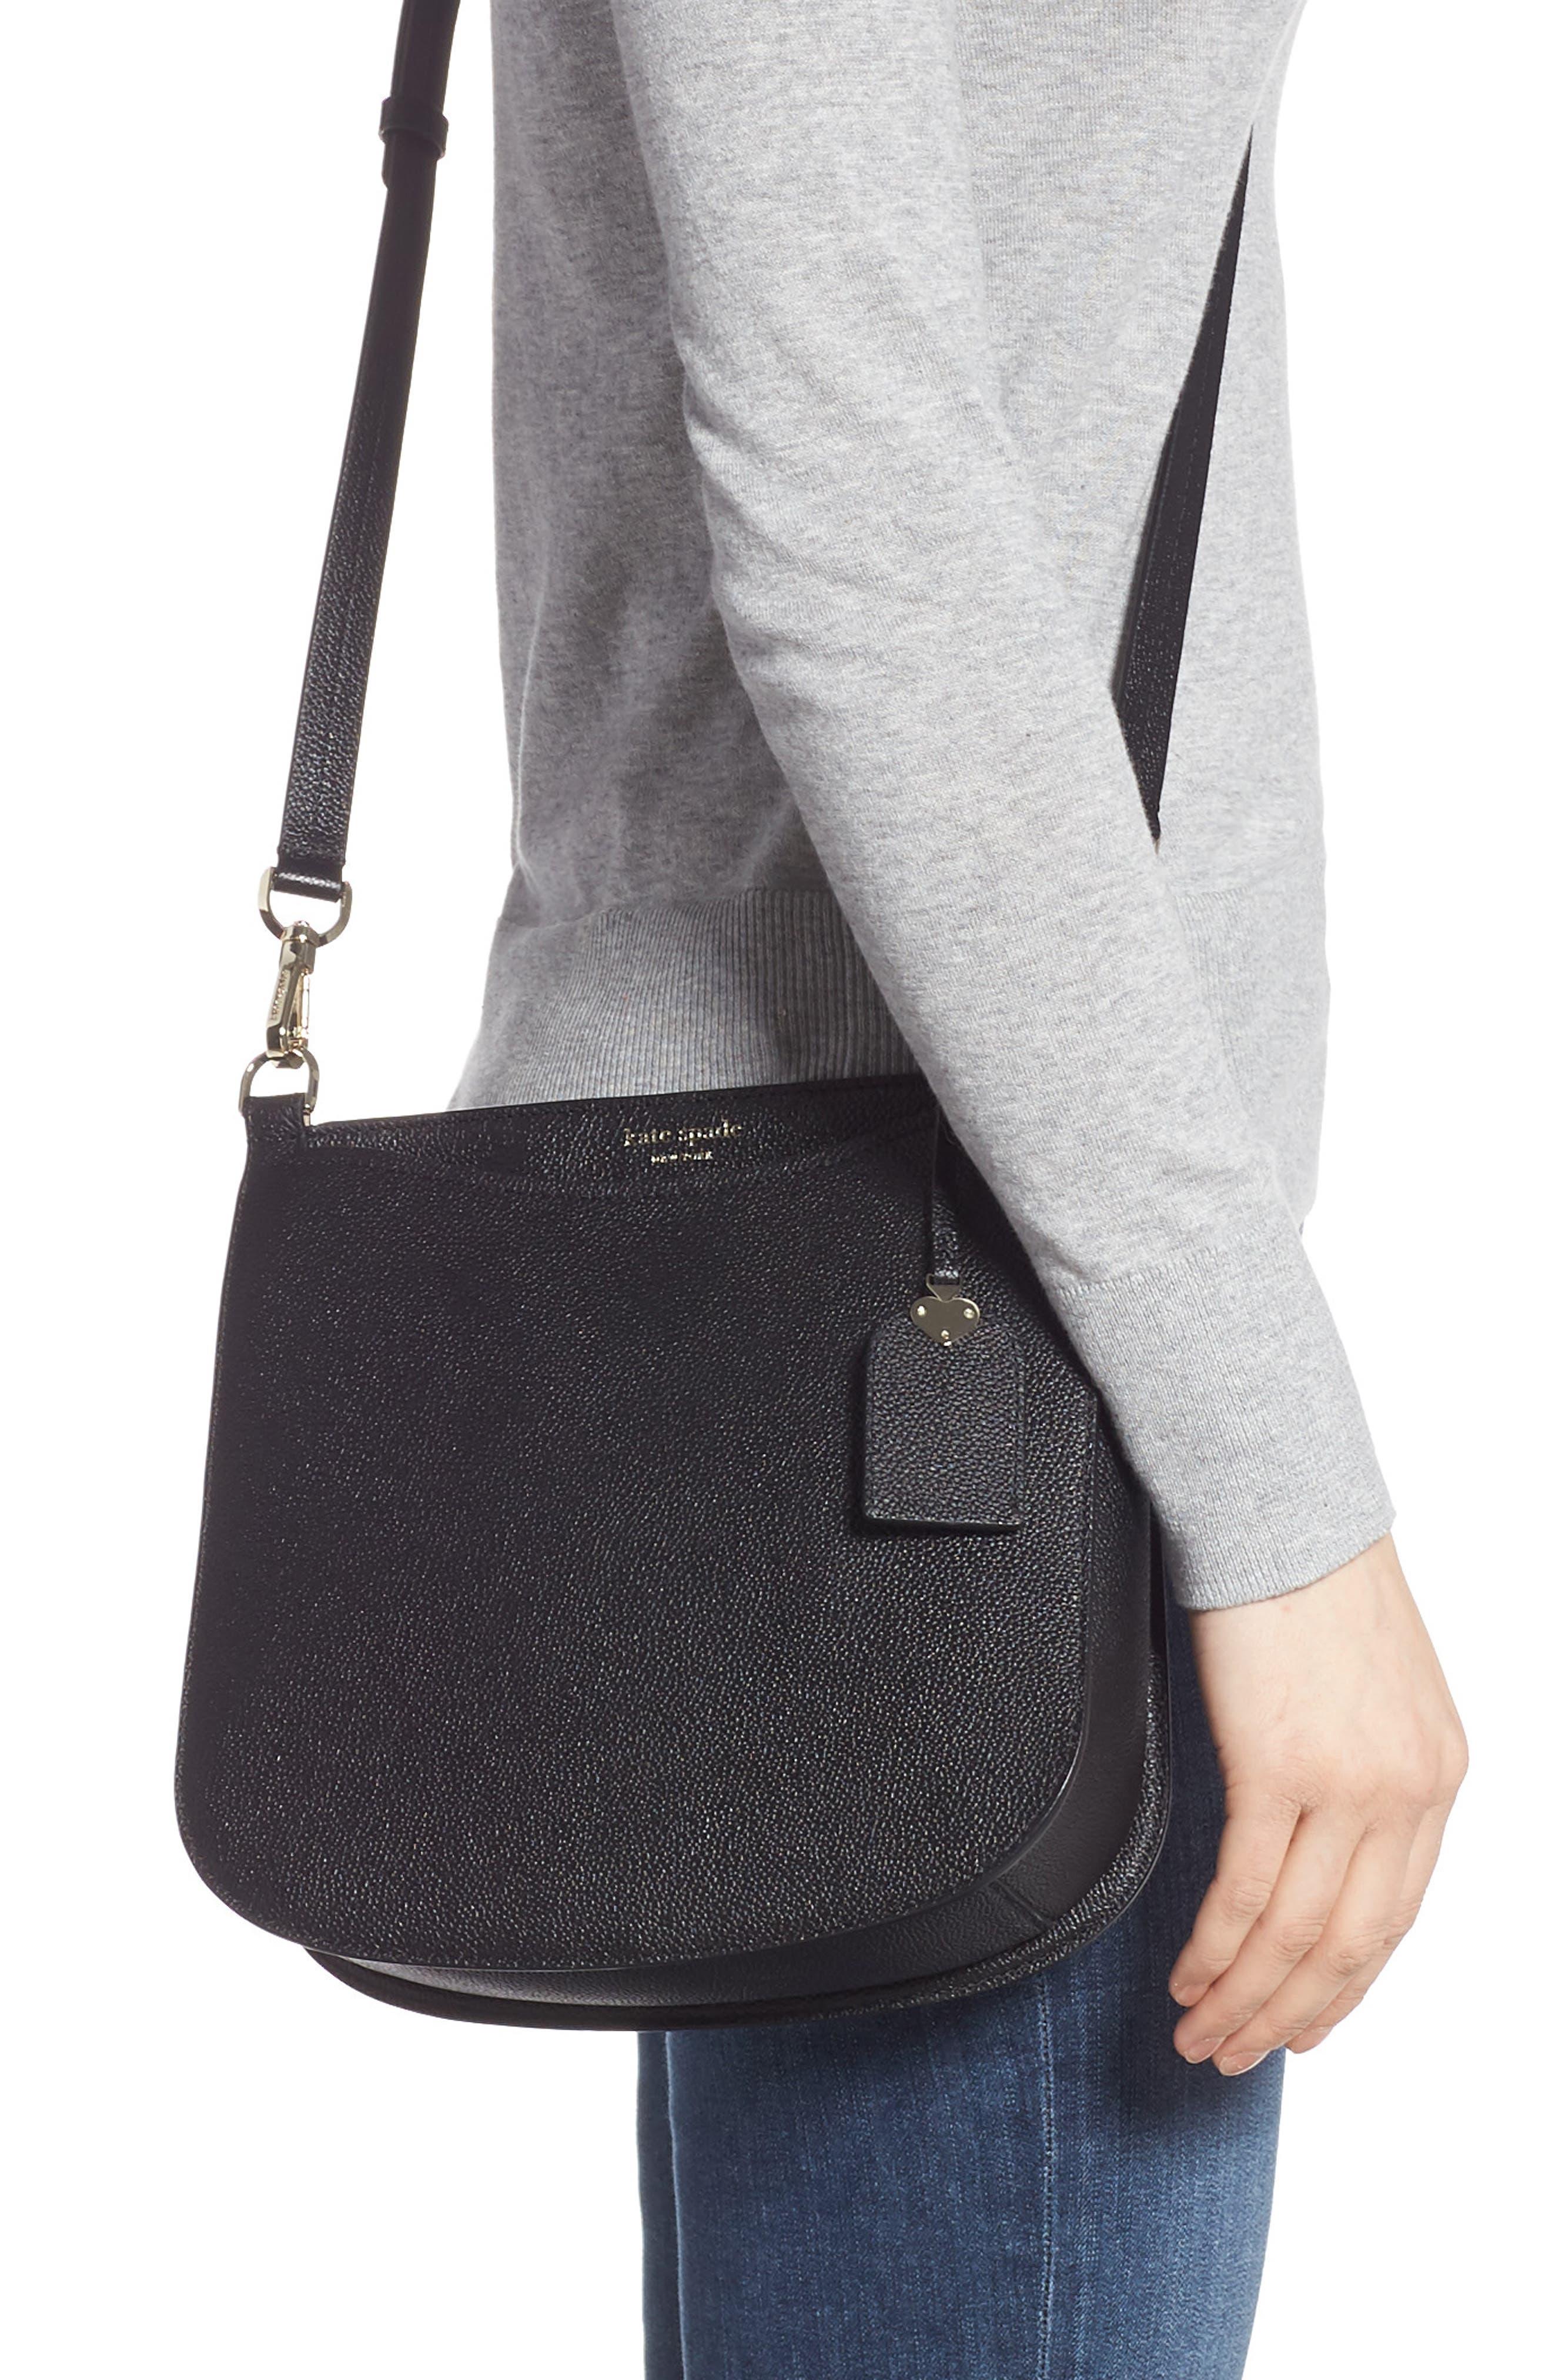 KATE SPADE NEW YORK,                             margaux large crossbody bag,                             Alternate thumbnail 2, color,                             BLACK